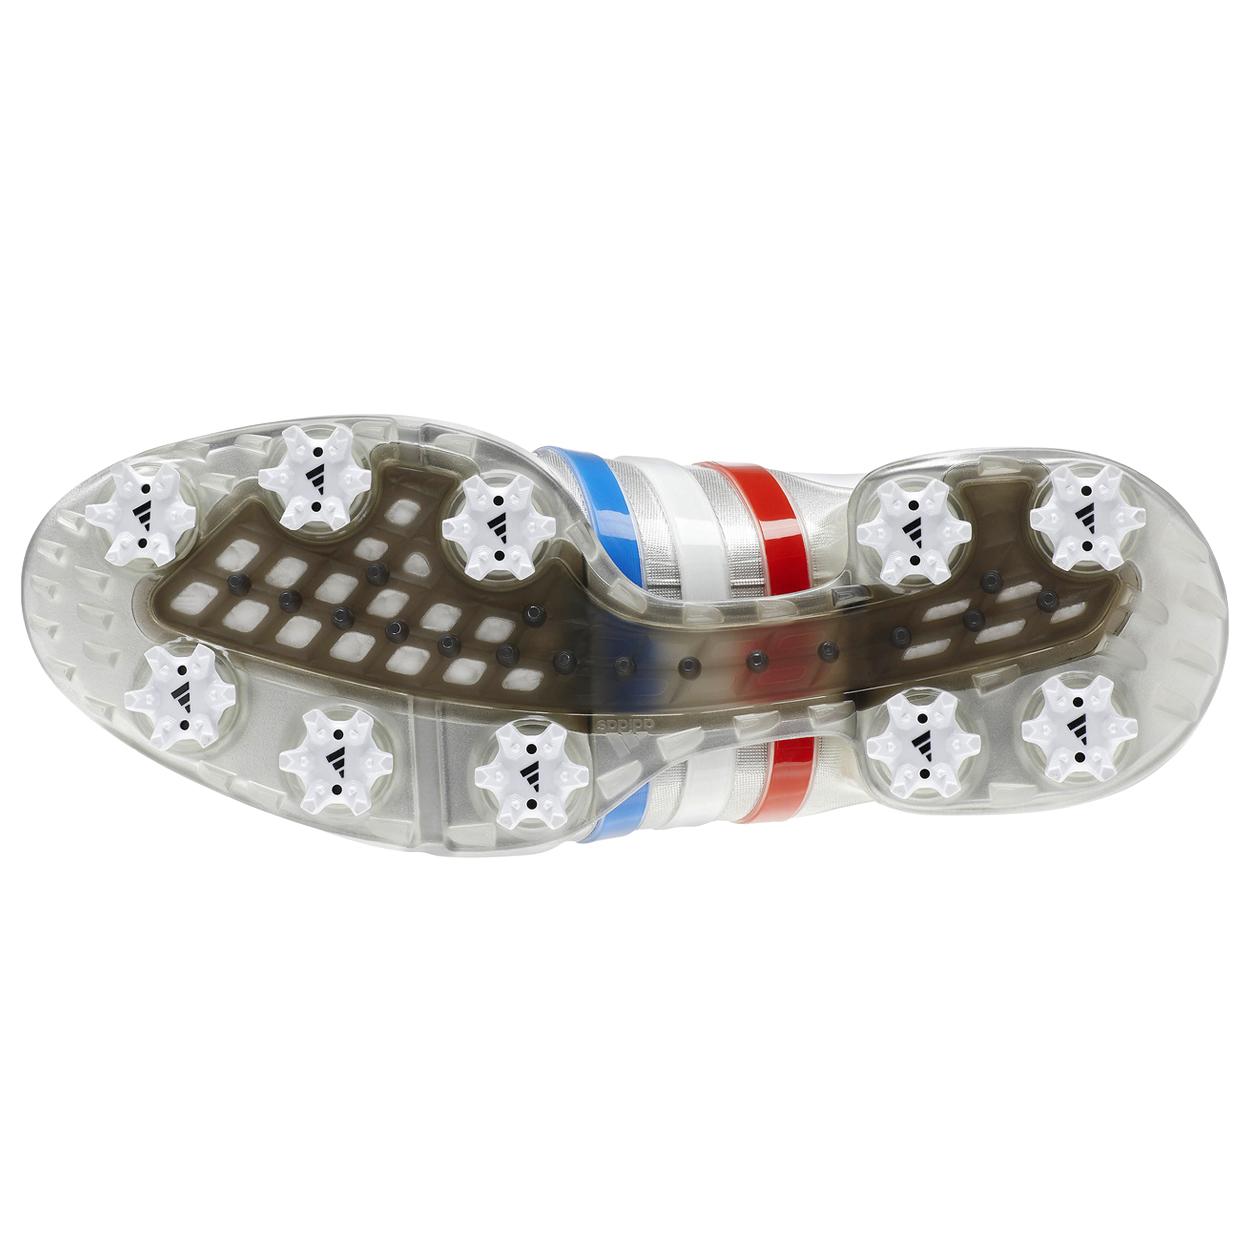 Adidas-Tour-360-2-0-Zapatos-De-Golf-De-Cuero-A-ESTRENAR miniatura 12